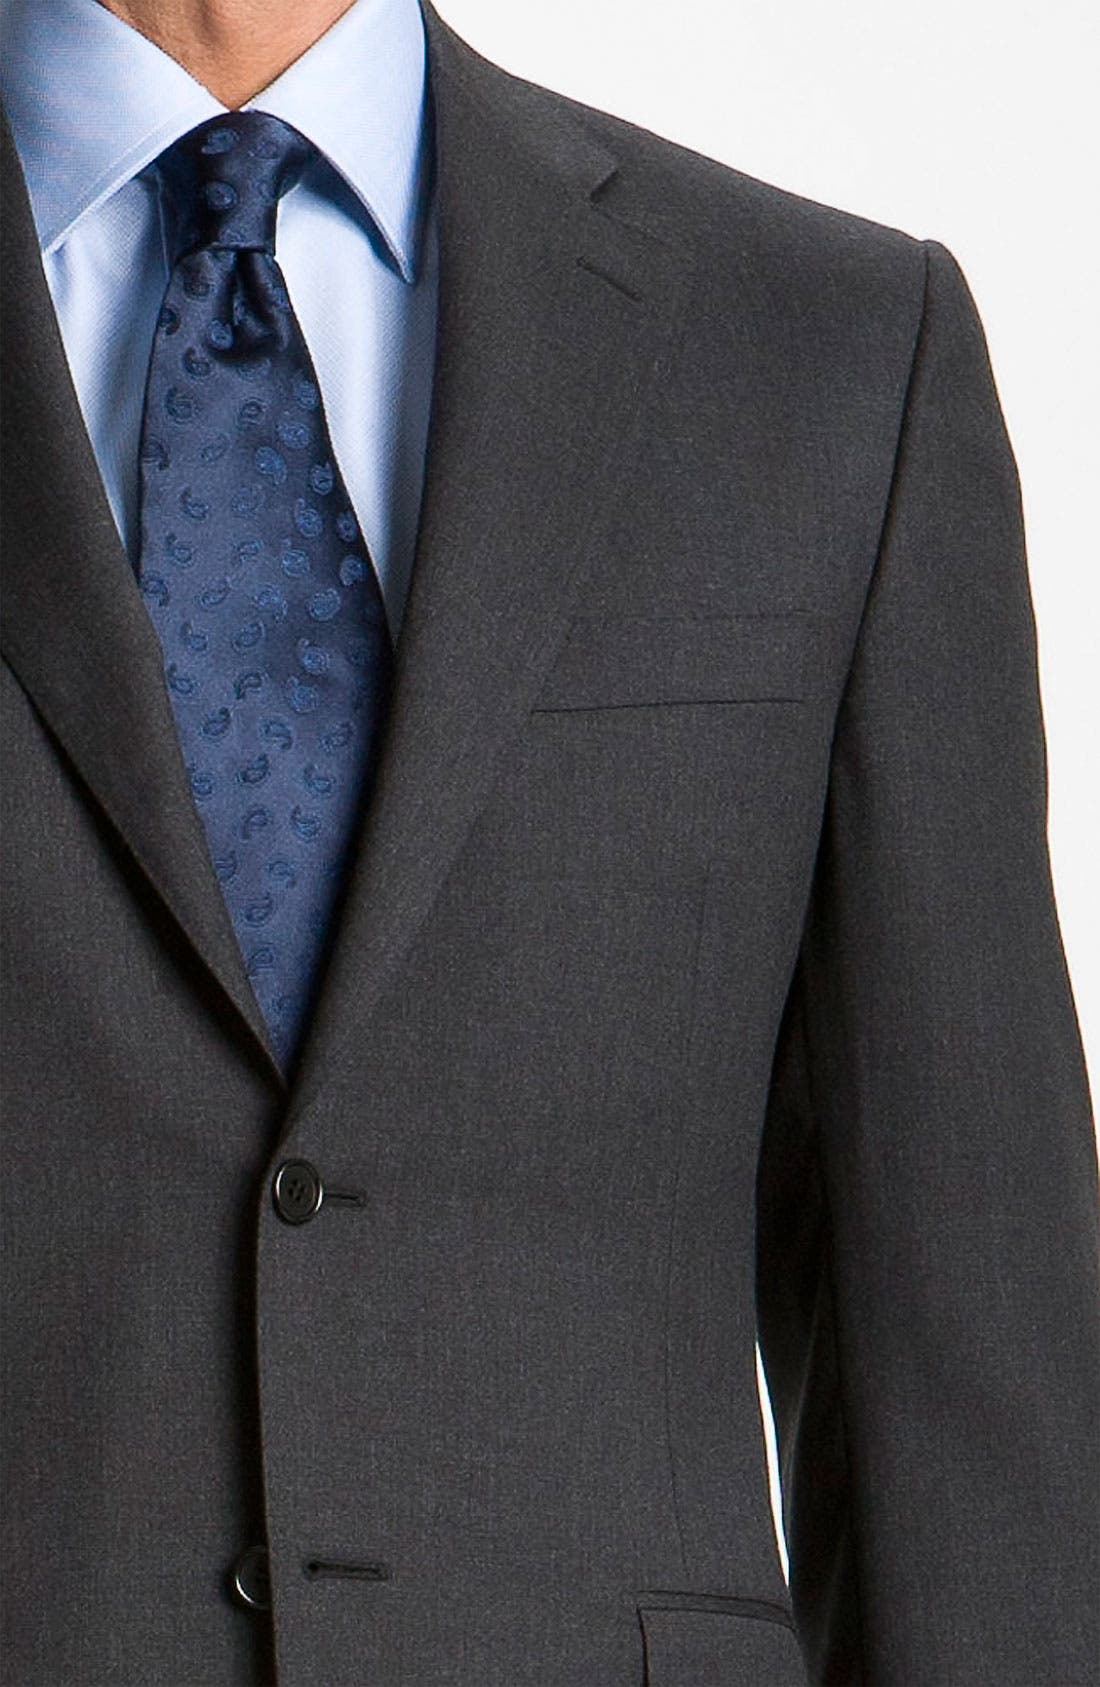 Classic Fit Wool Suit,                             Alternate thumbnail 13, color,                             CHARCOAL